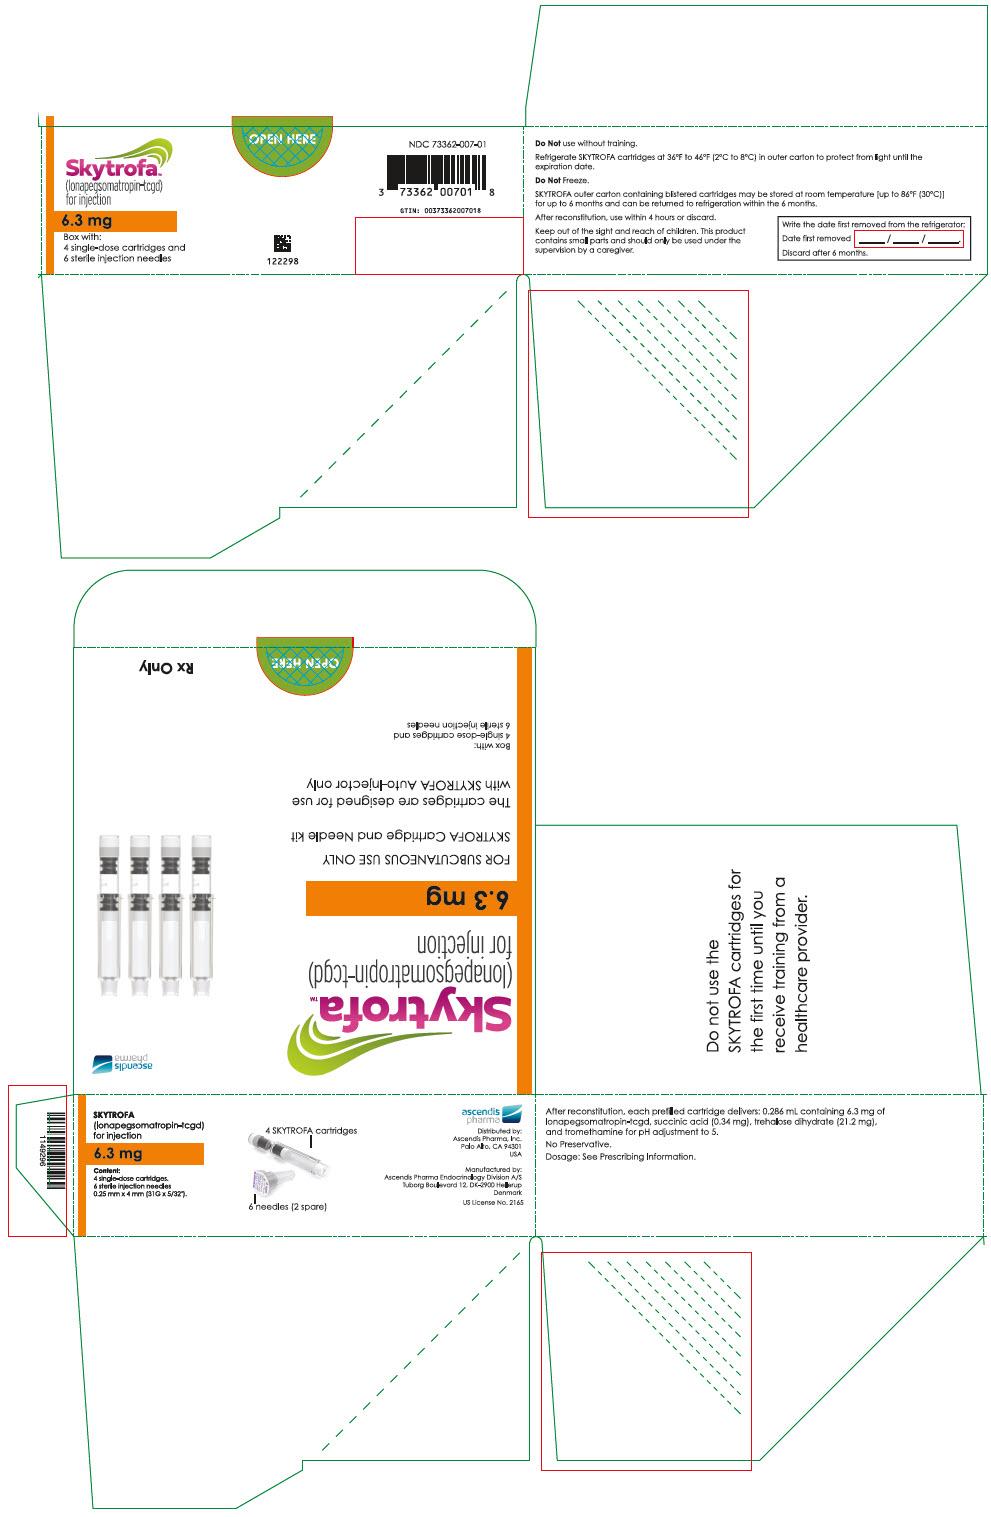 PRINCIPAL DISPLAY PANEL - 6.3 mg Cartridge Blister Pack Carton